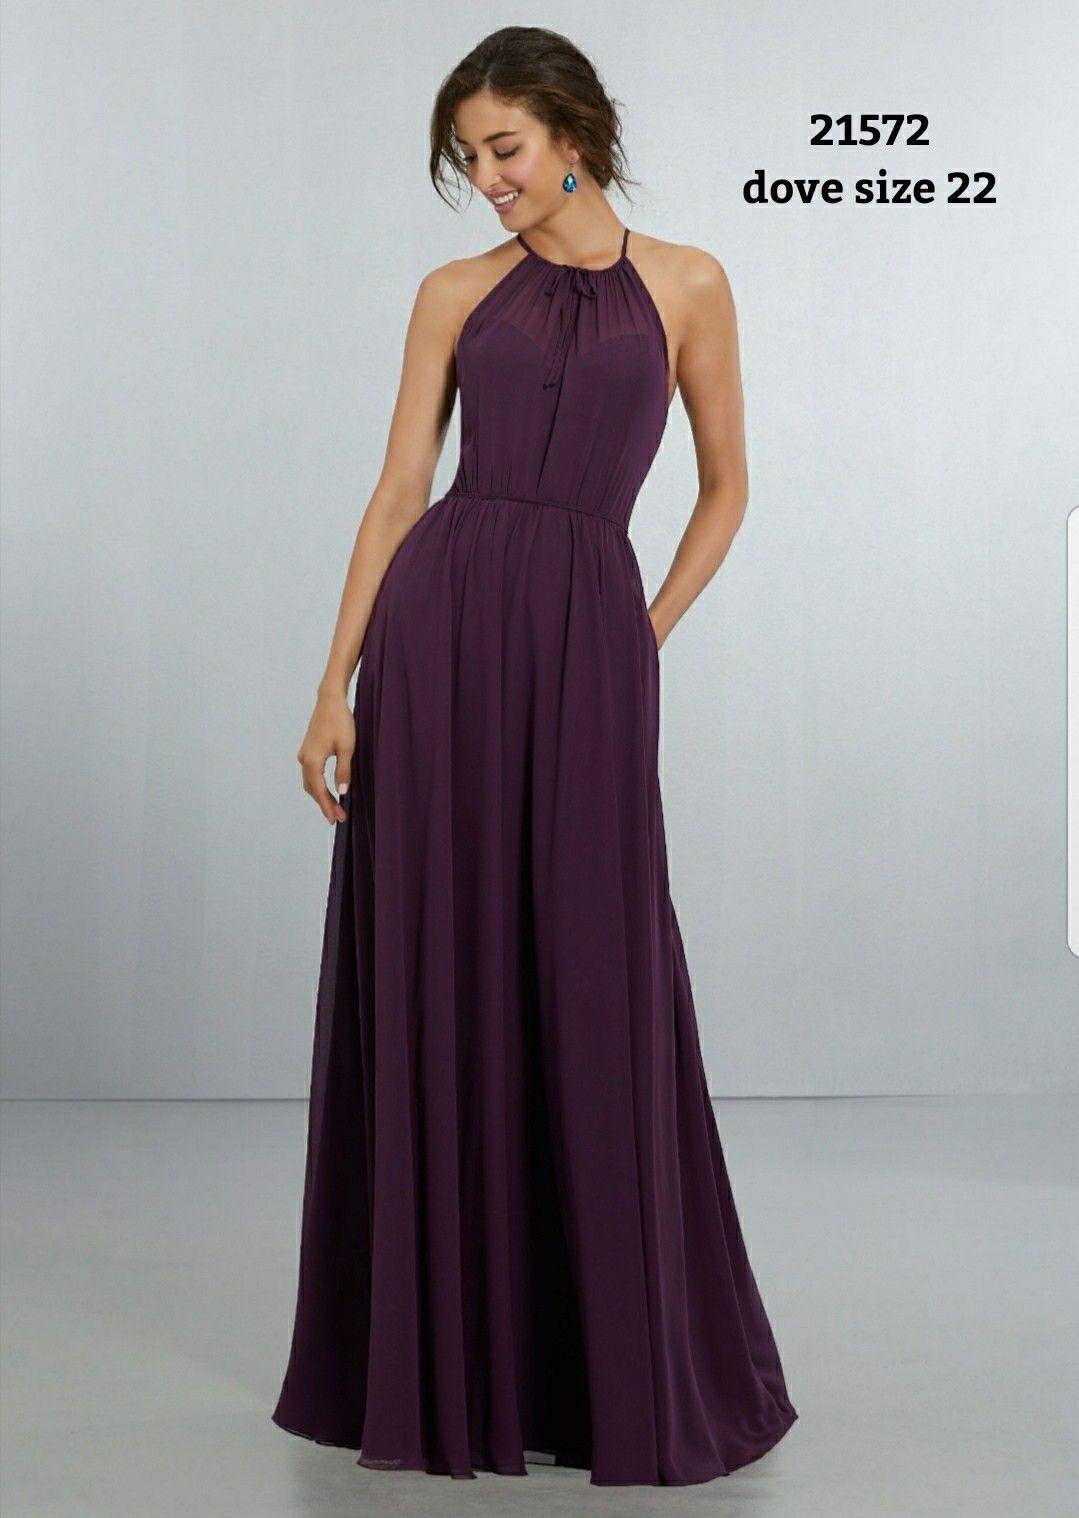 Best Bridesmaid Dress Style For Plus Size   Huston Fislar Photography